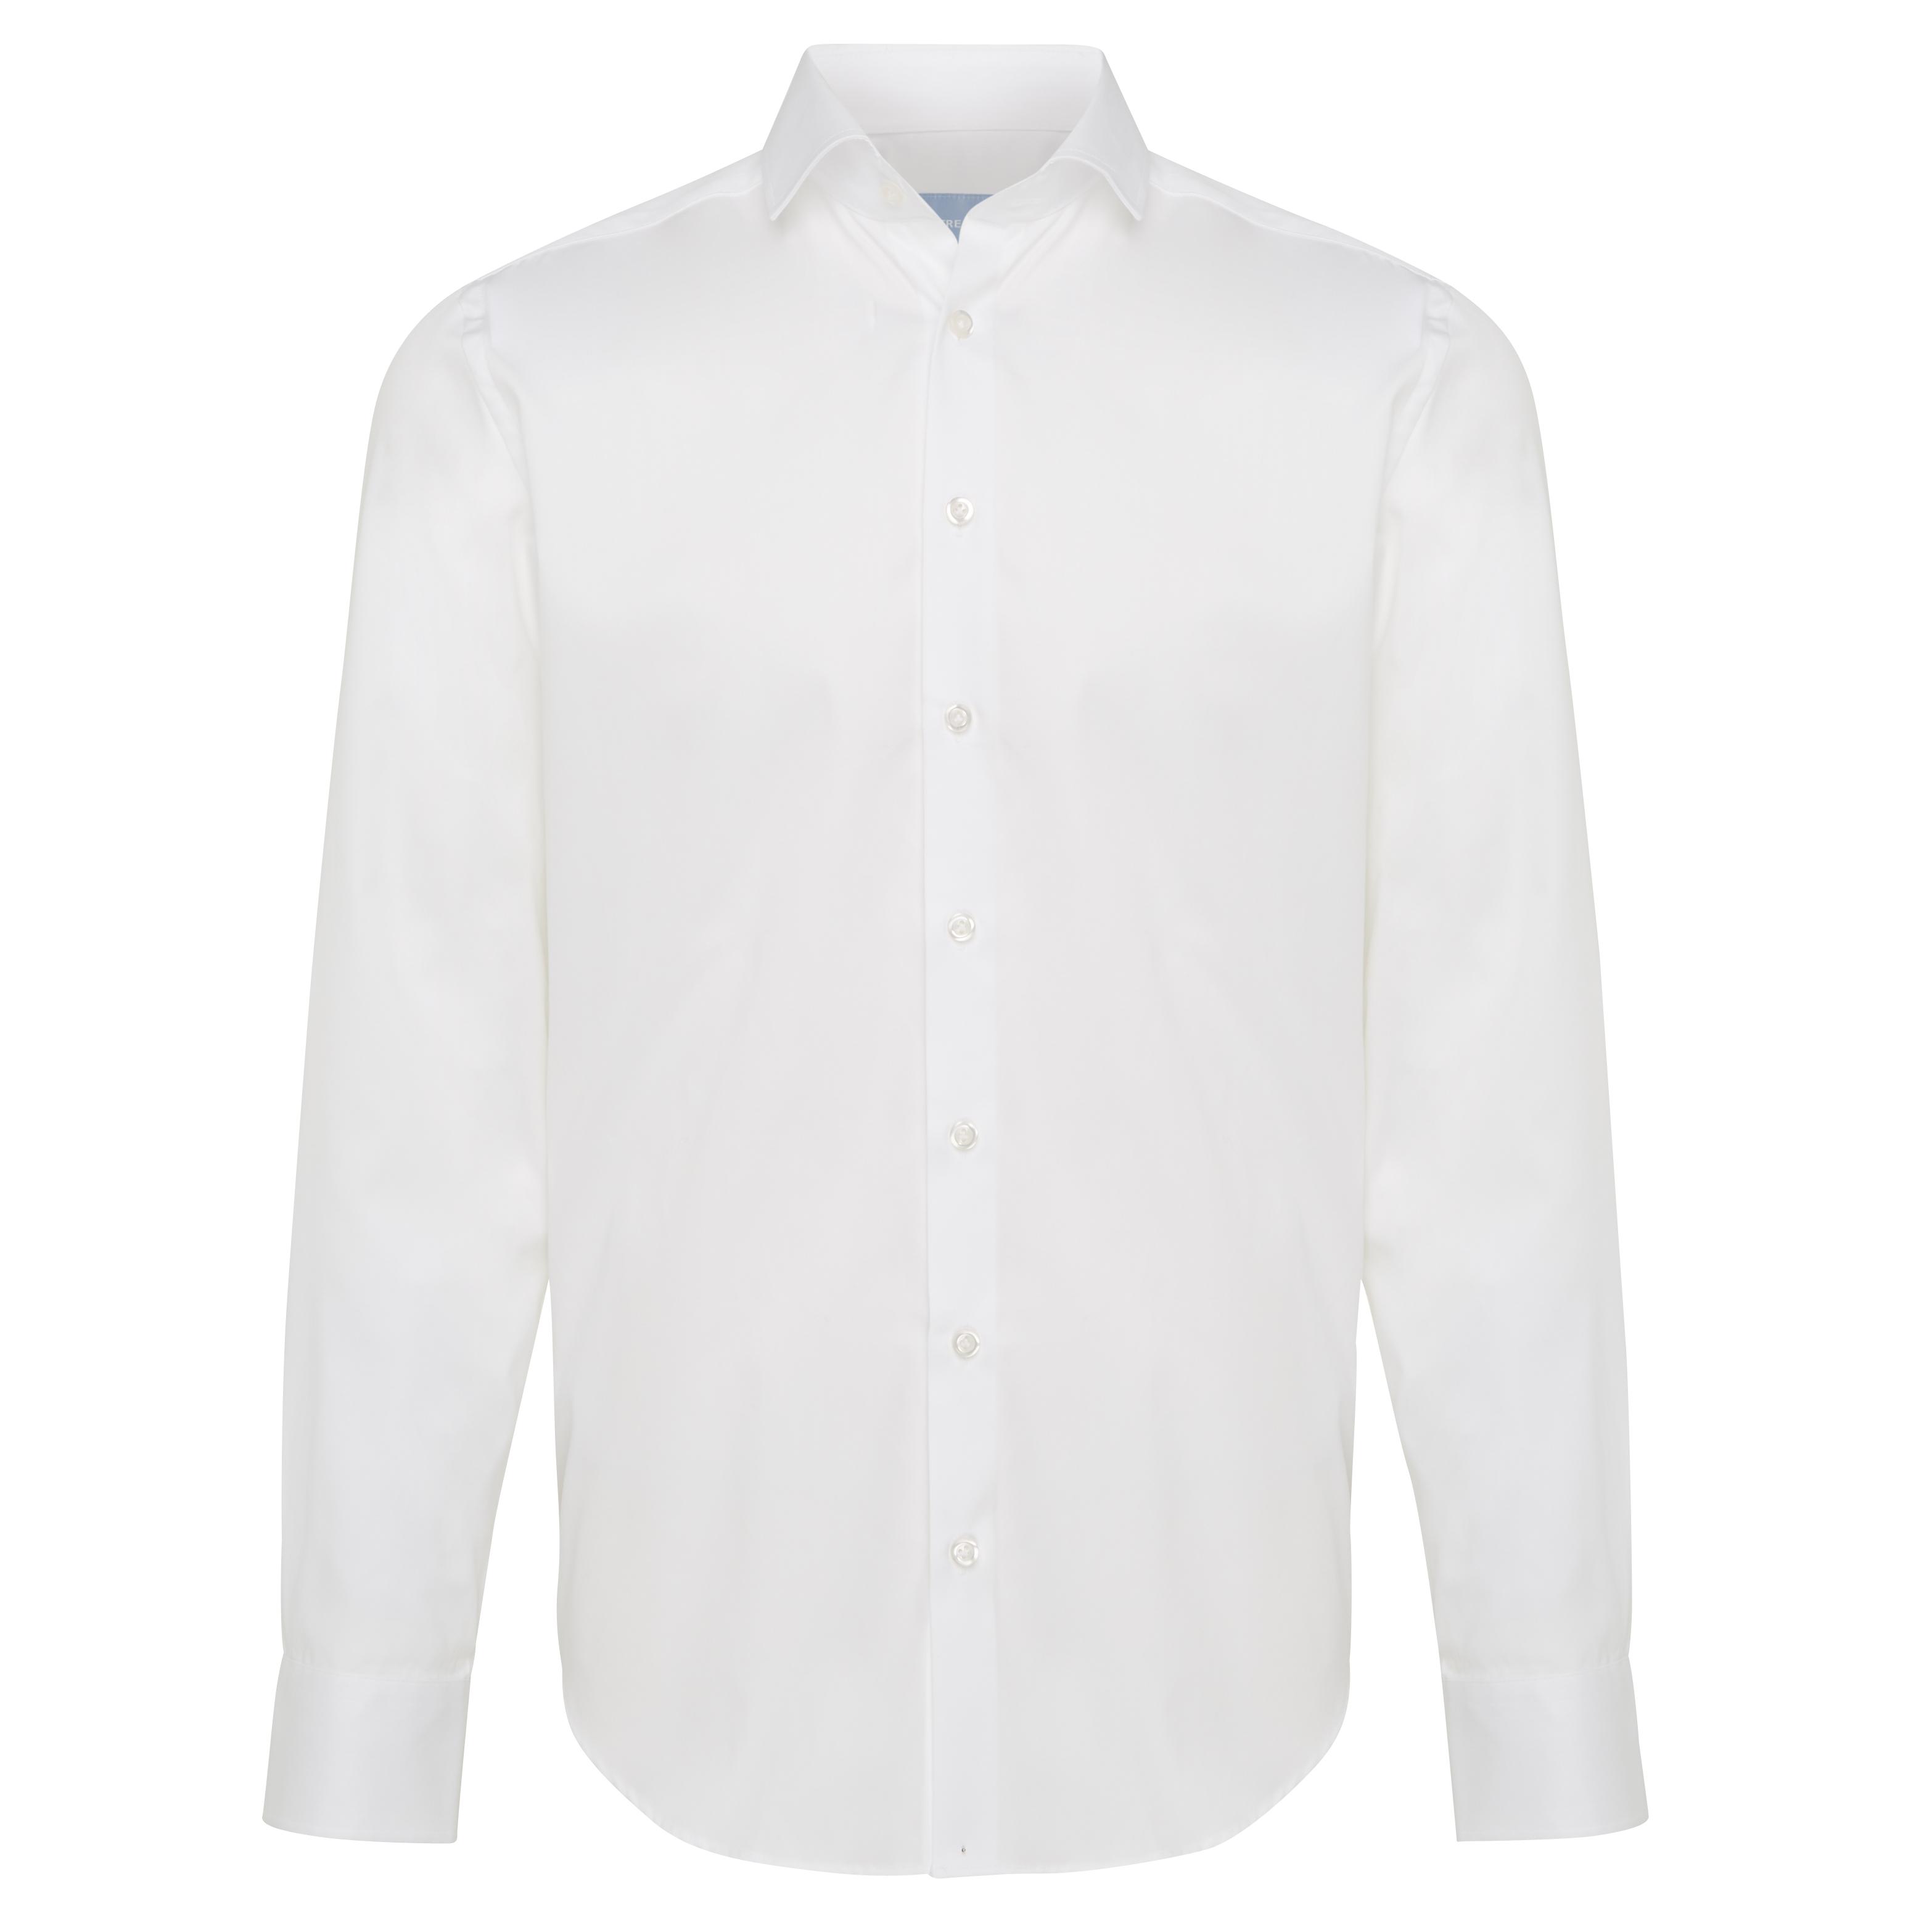 Shirt non-iron plain white - Regular Fit